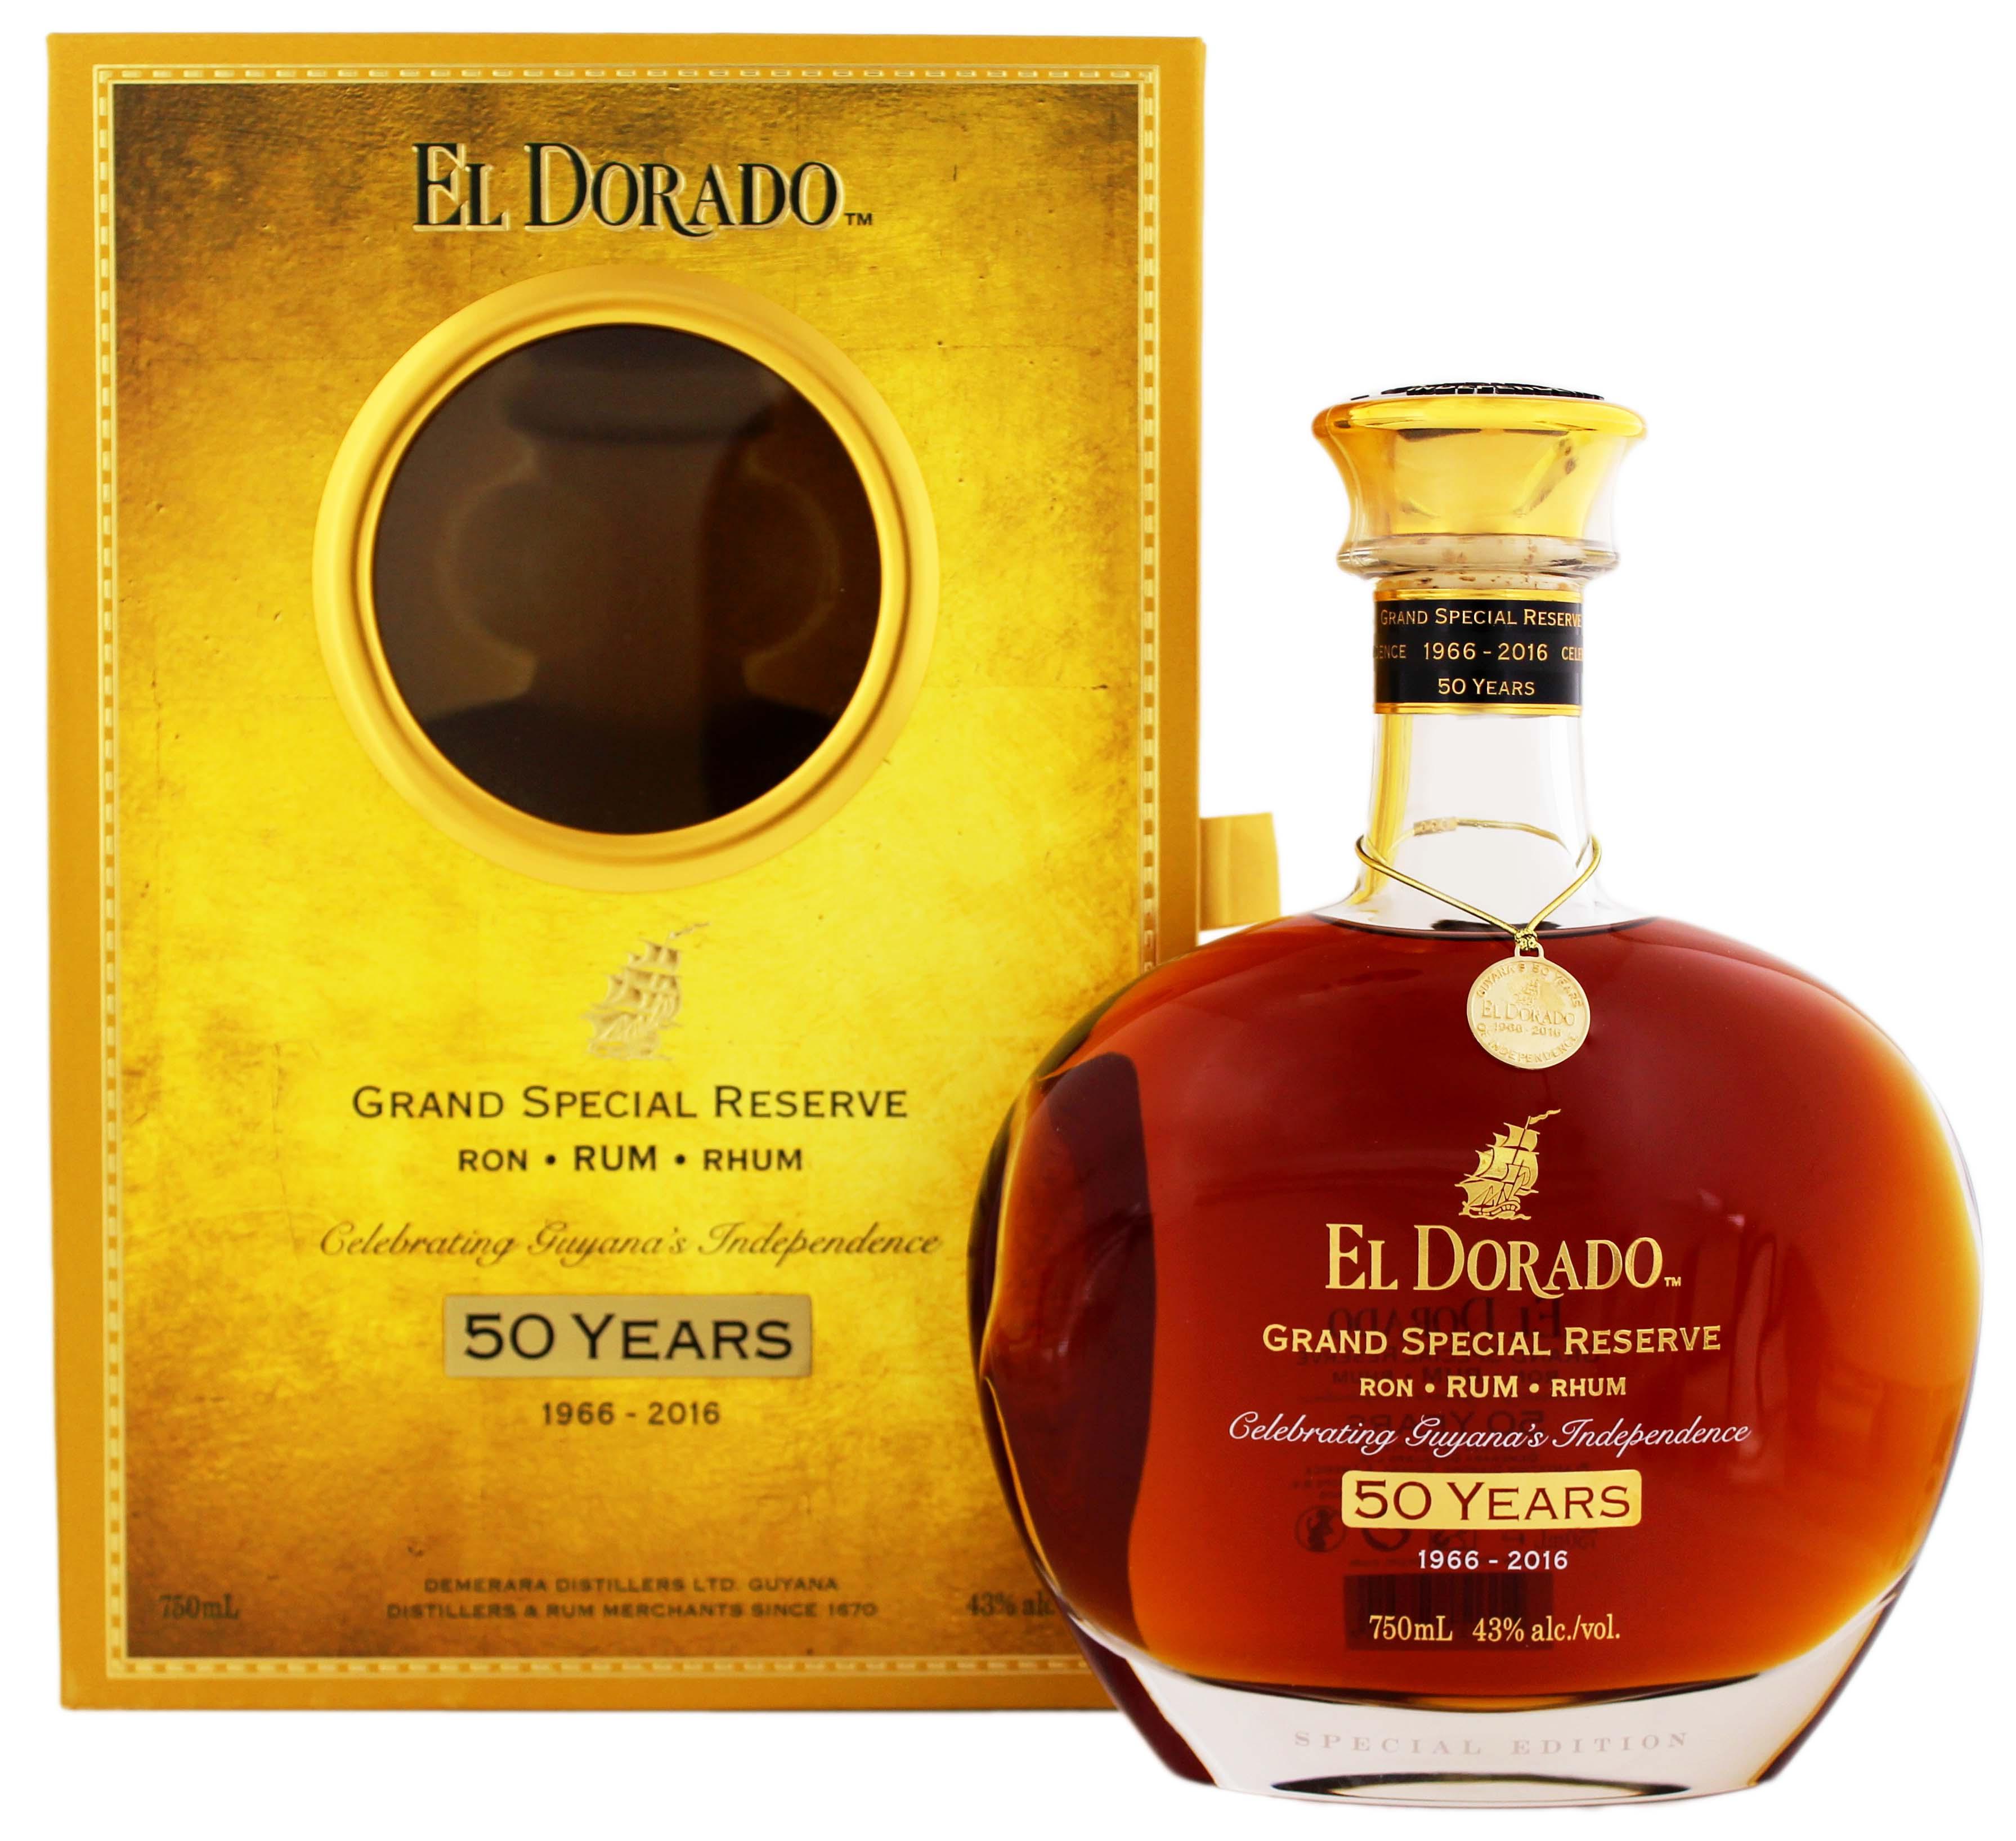 El Dorado 50th Anniversary Grand Special Reserve Rum 0,75L